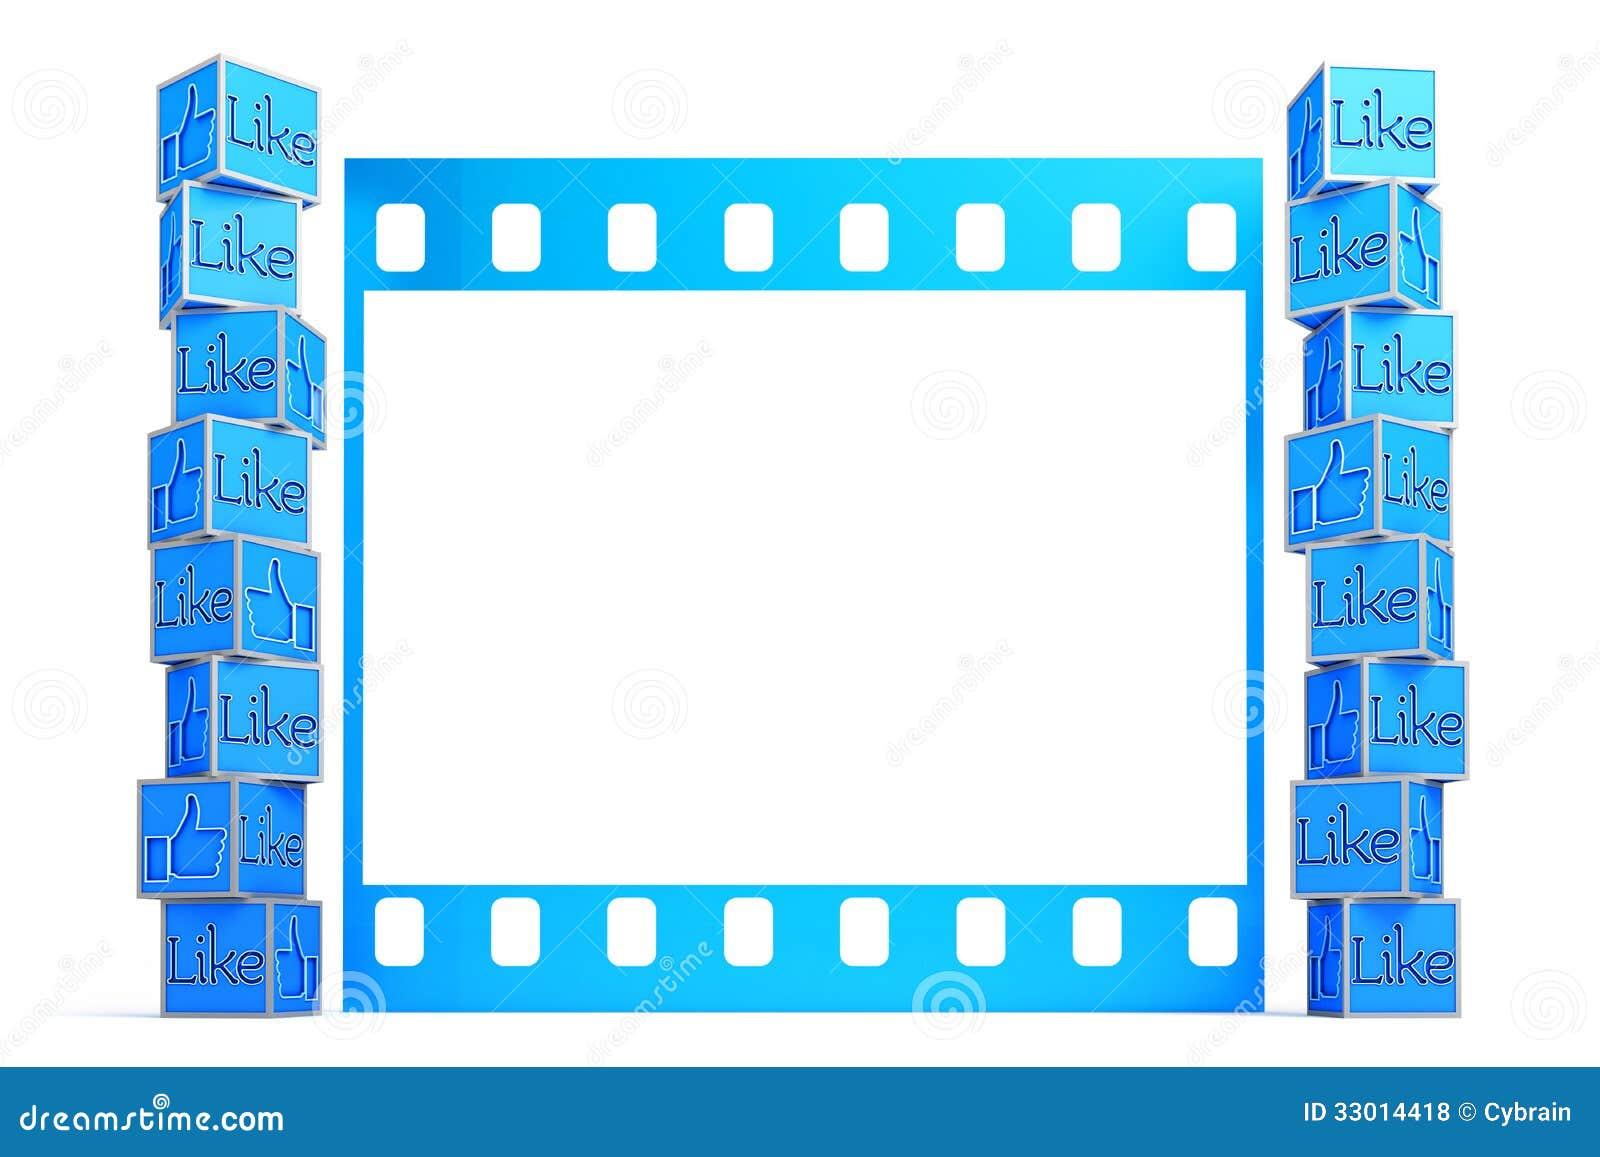 photo frame template page 2 photo frame template page 3